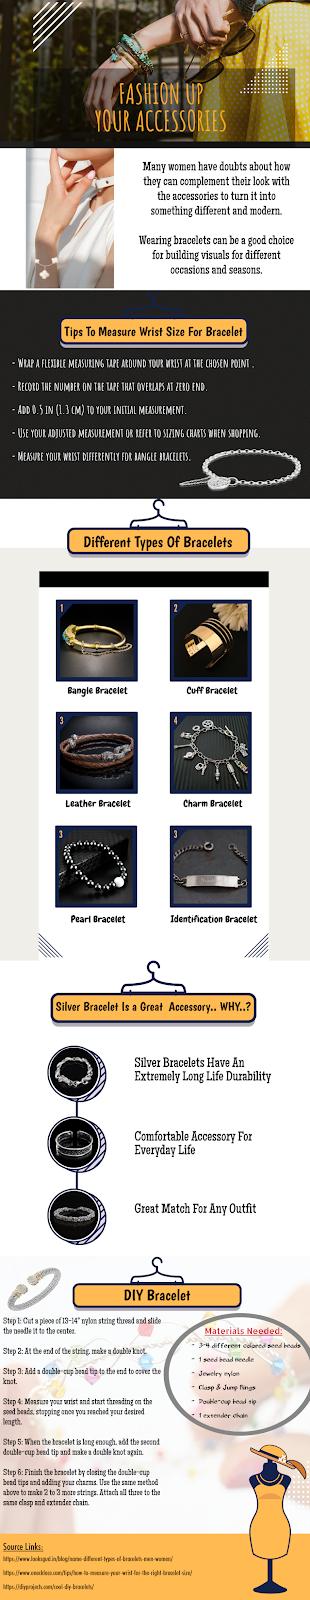 bracelets infographic